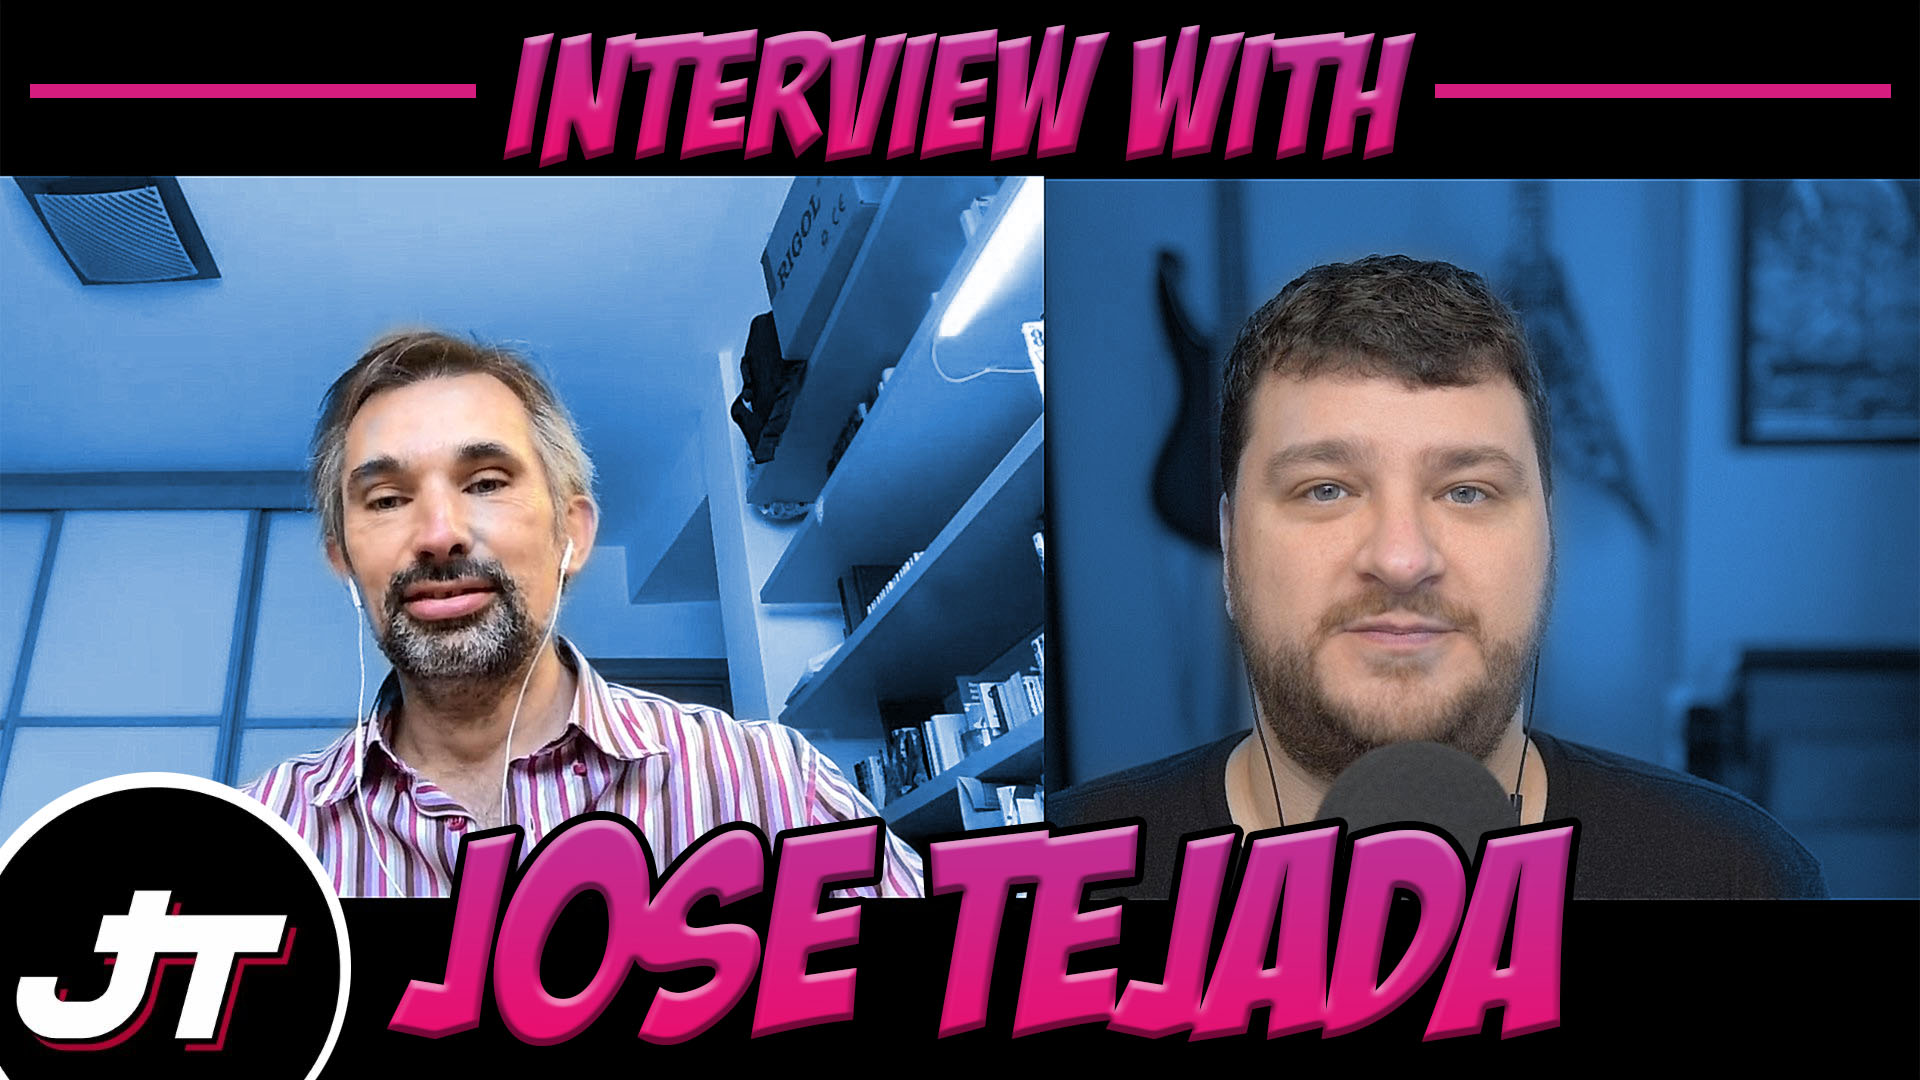 Interview with Jose Tejada aka Jotego